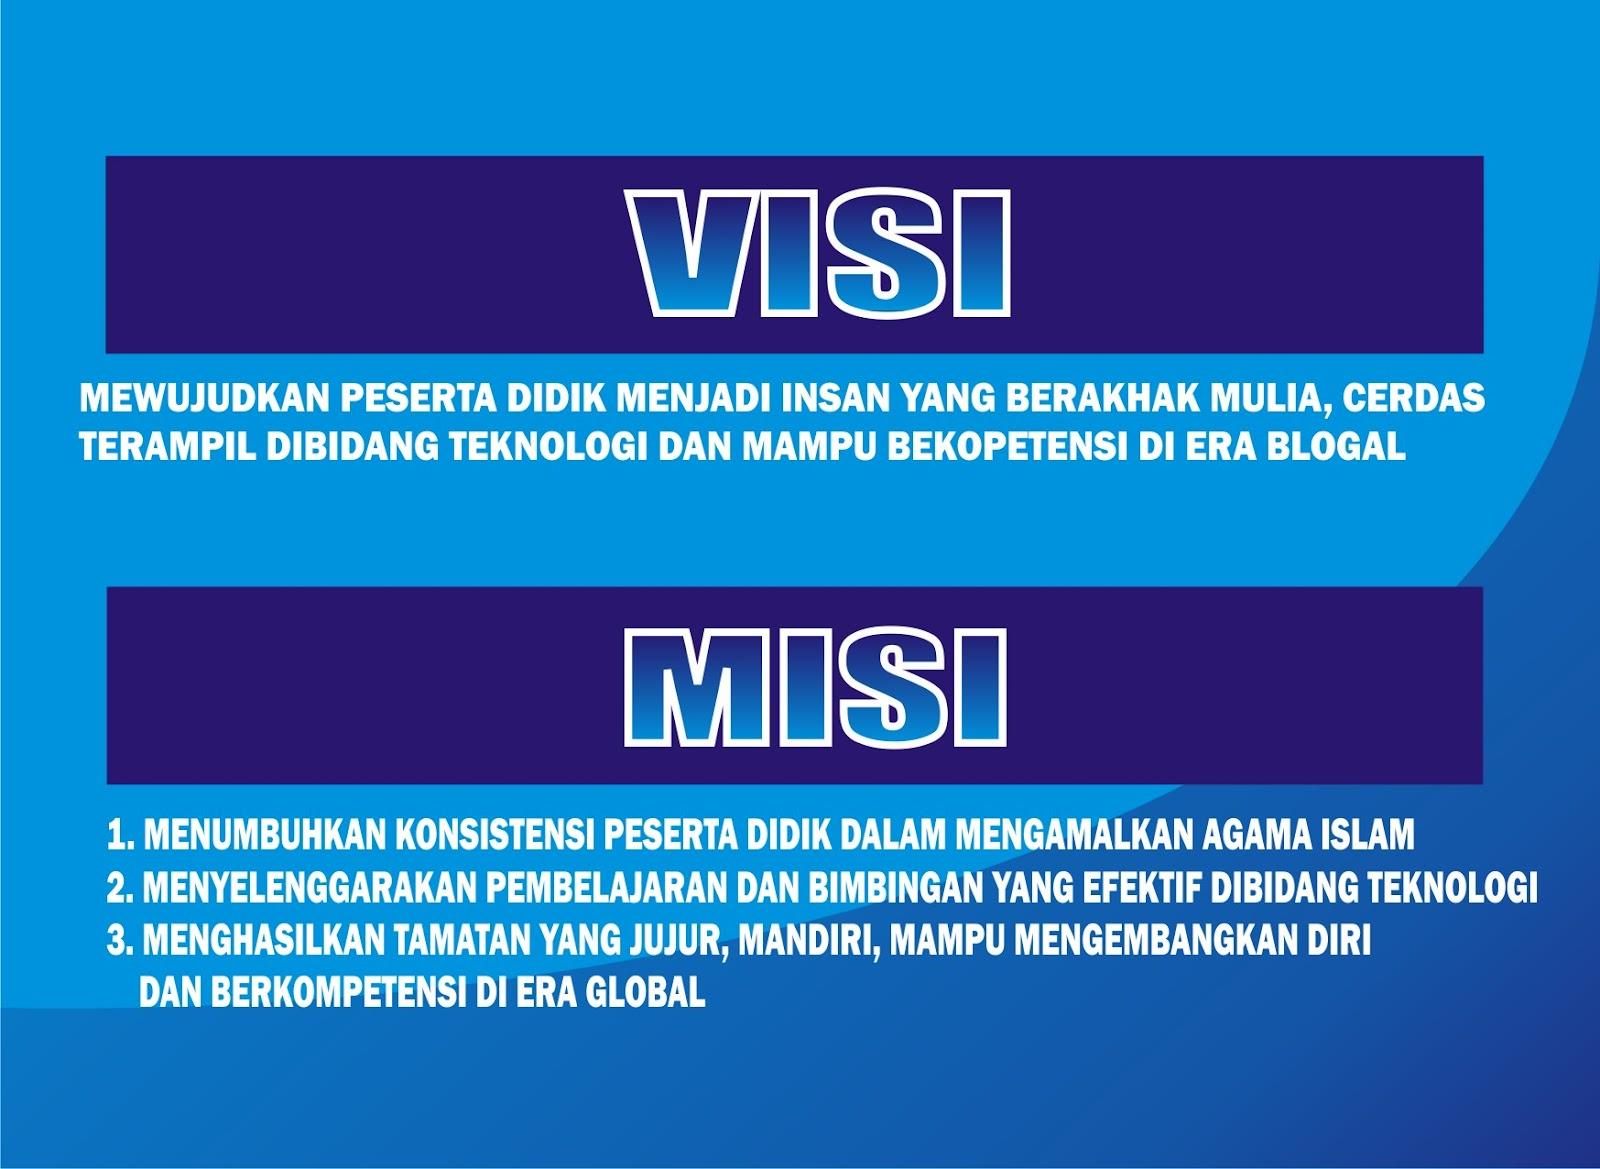 Visi Dan Misi Smk Muhammadiyah 3 Surakarta Heri Syaifudin Blogg S